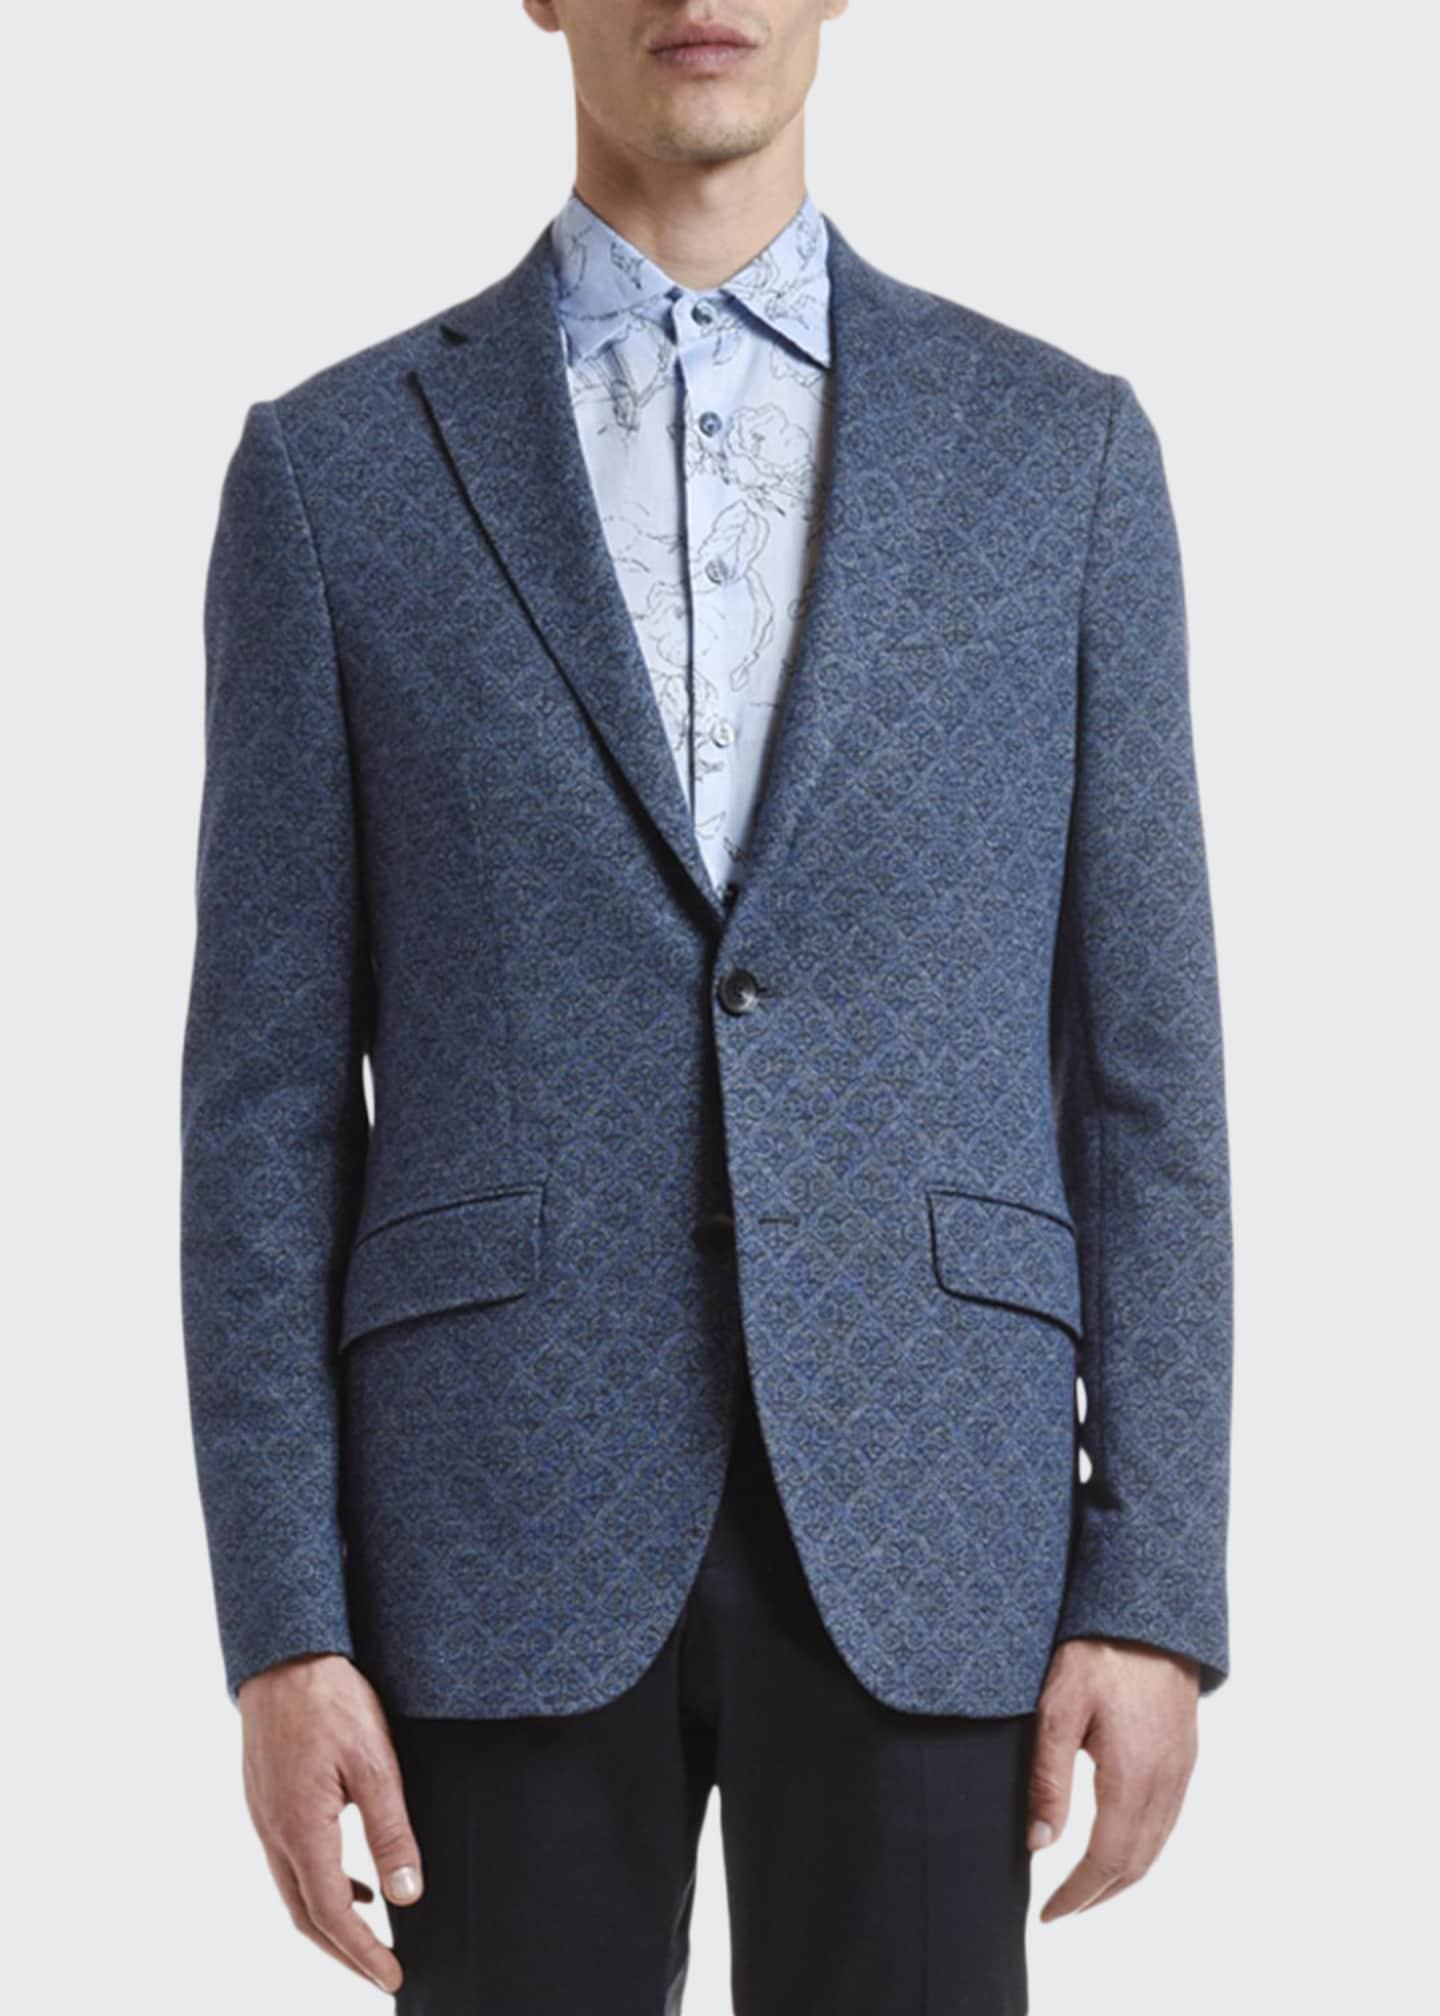 Etro Men's Cotton/Wool Jacquard Sport Coat